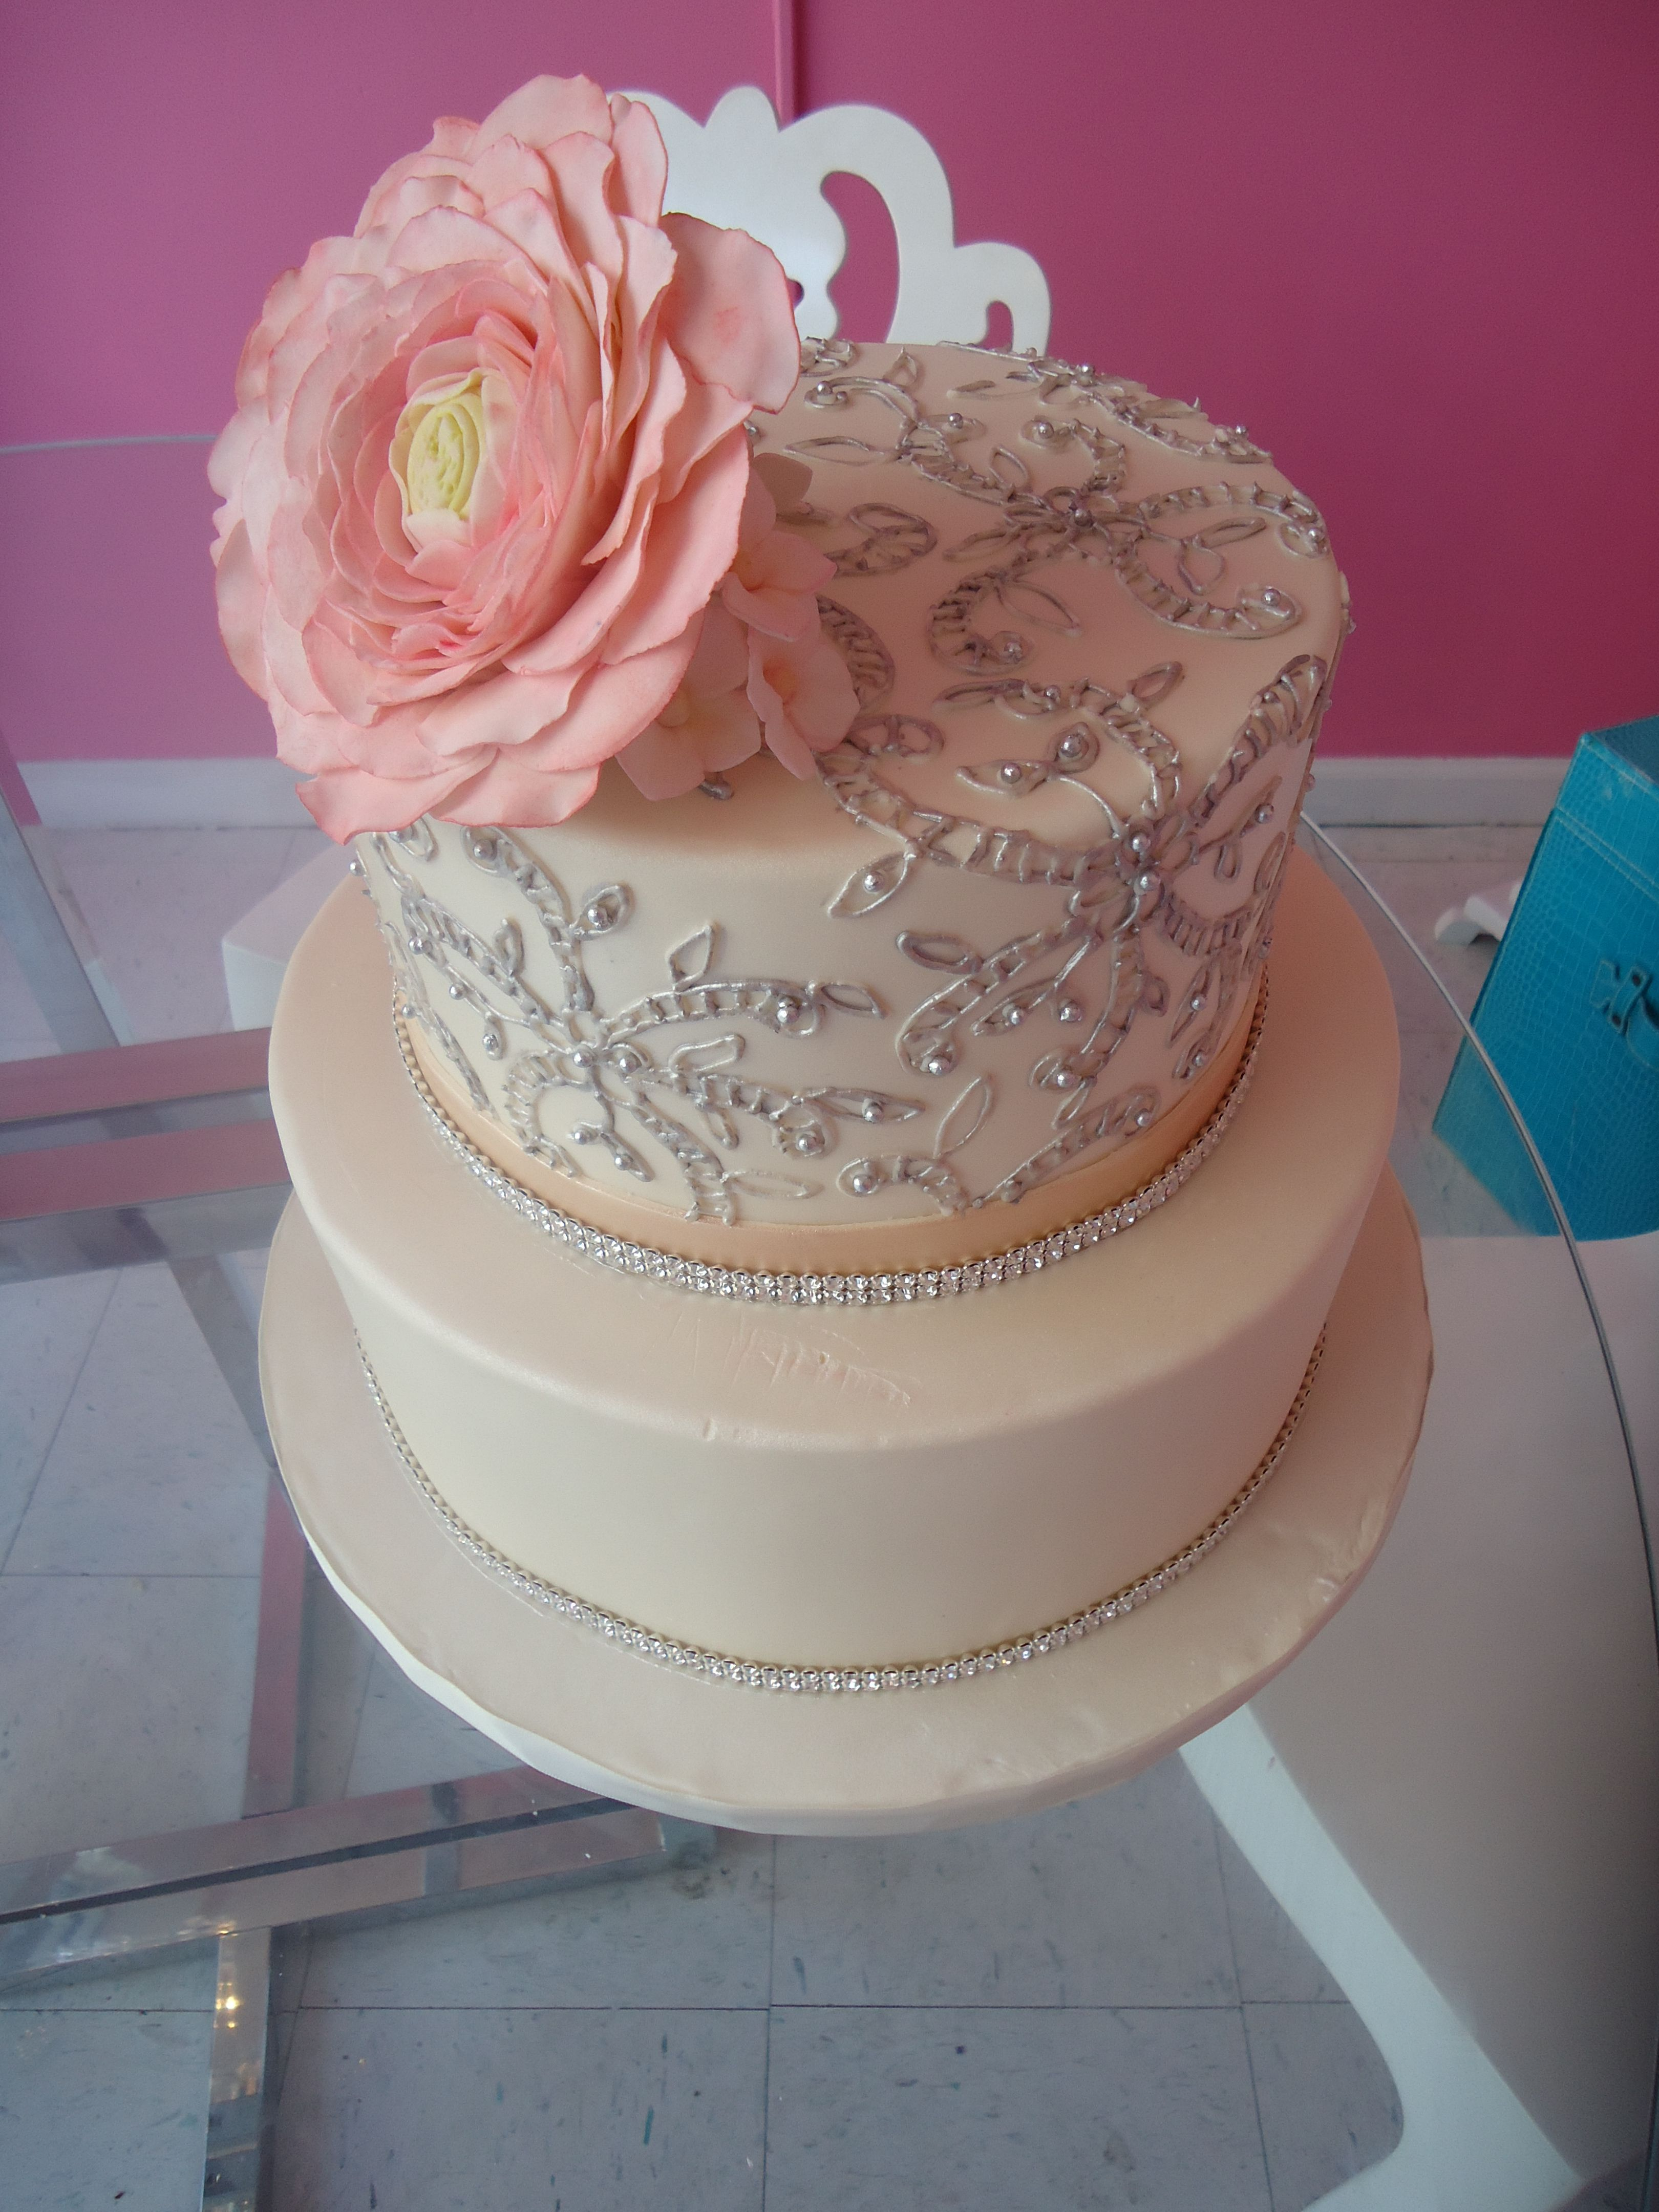 TIER Luxury Cakes Beautiful Dress Inspired Wedding Cake Tierluxurycakes